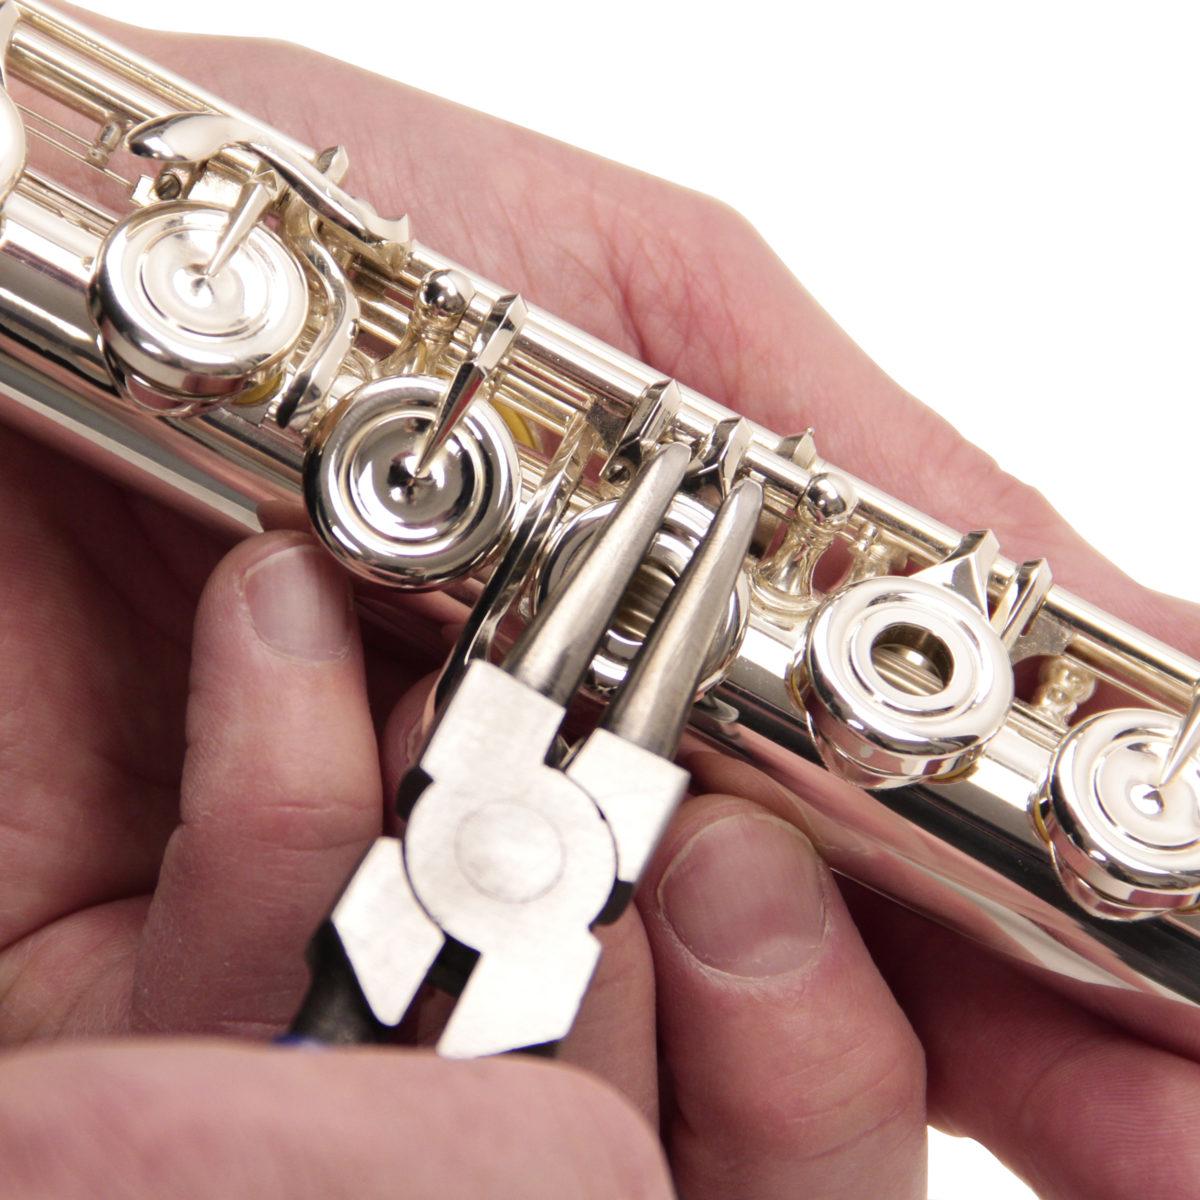 kowalski flute back arm plier 12